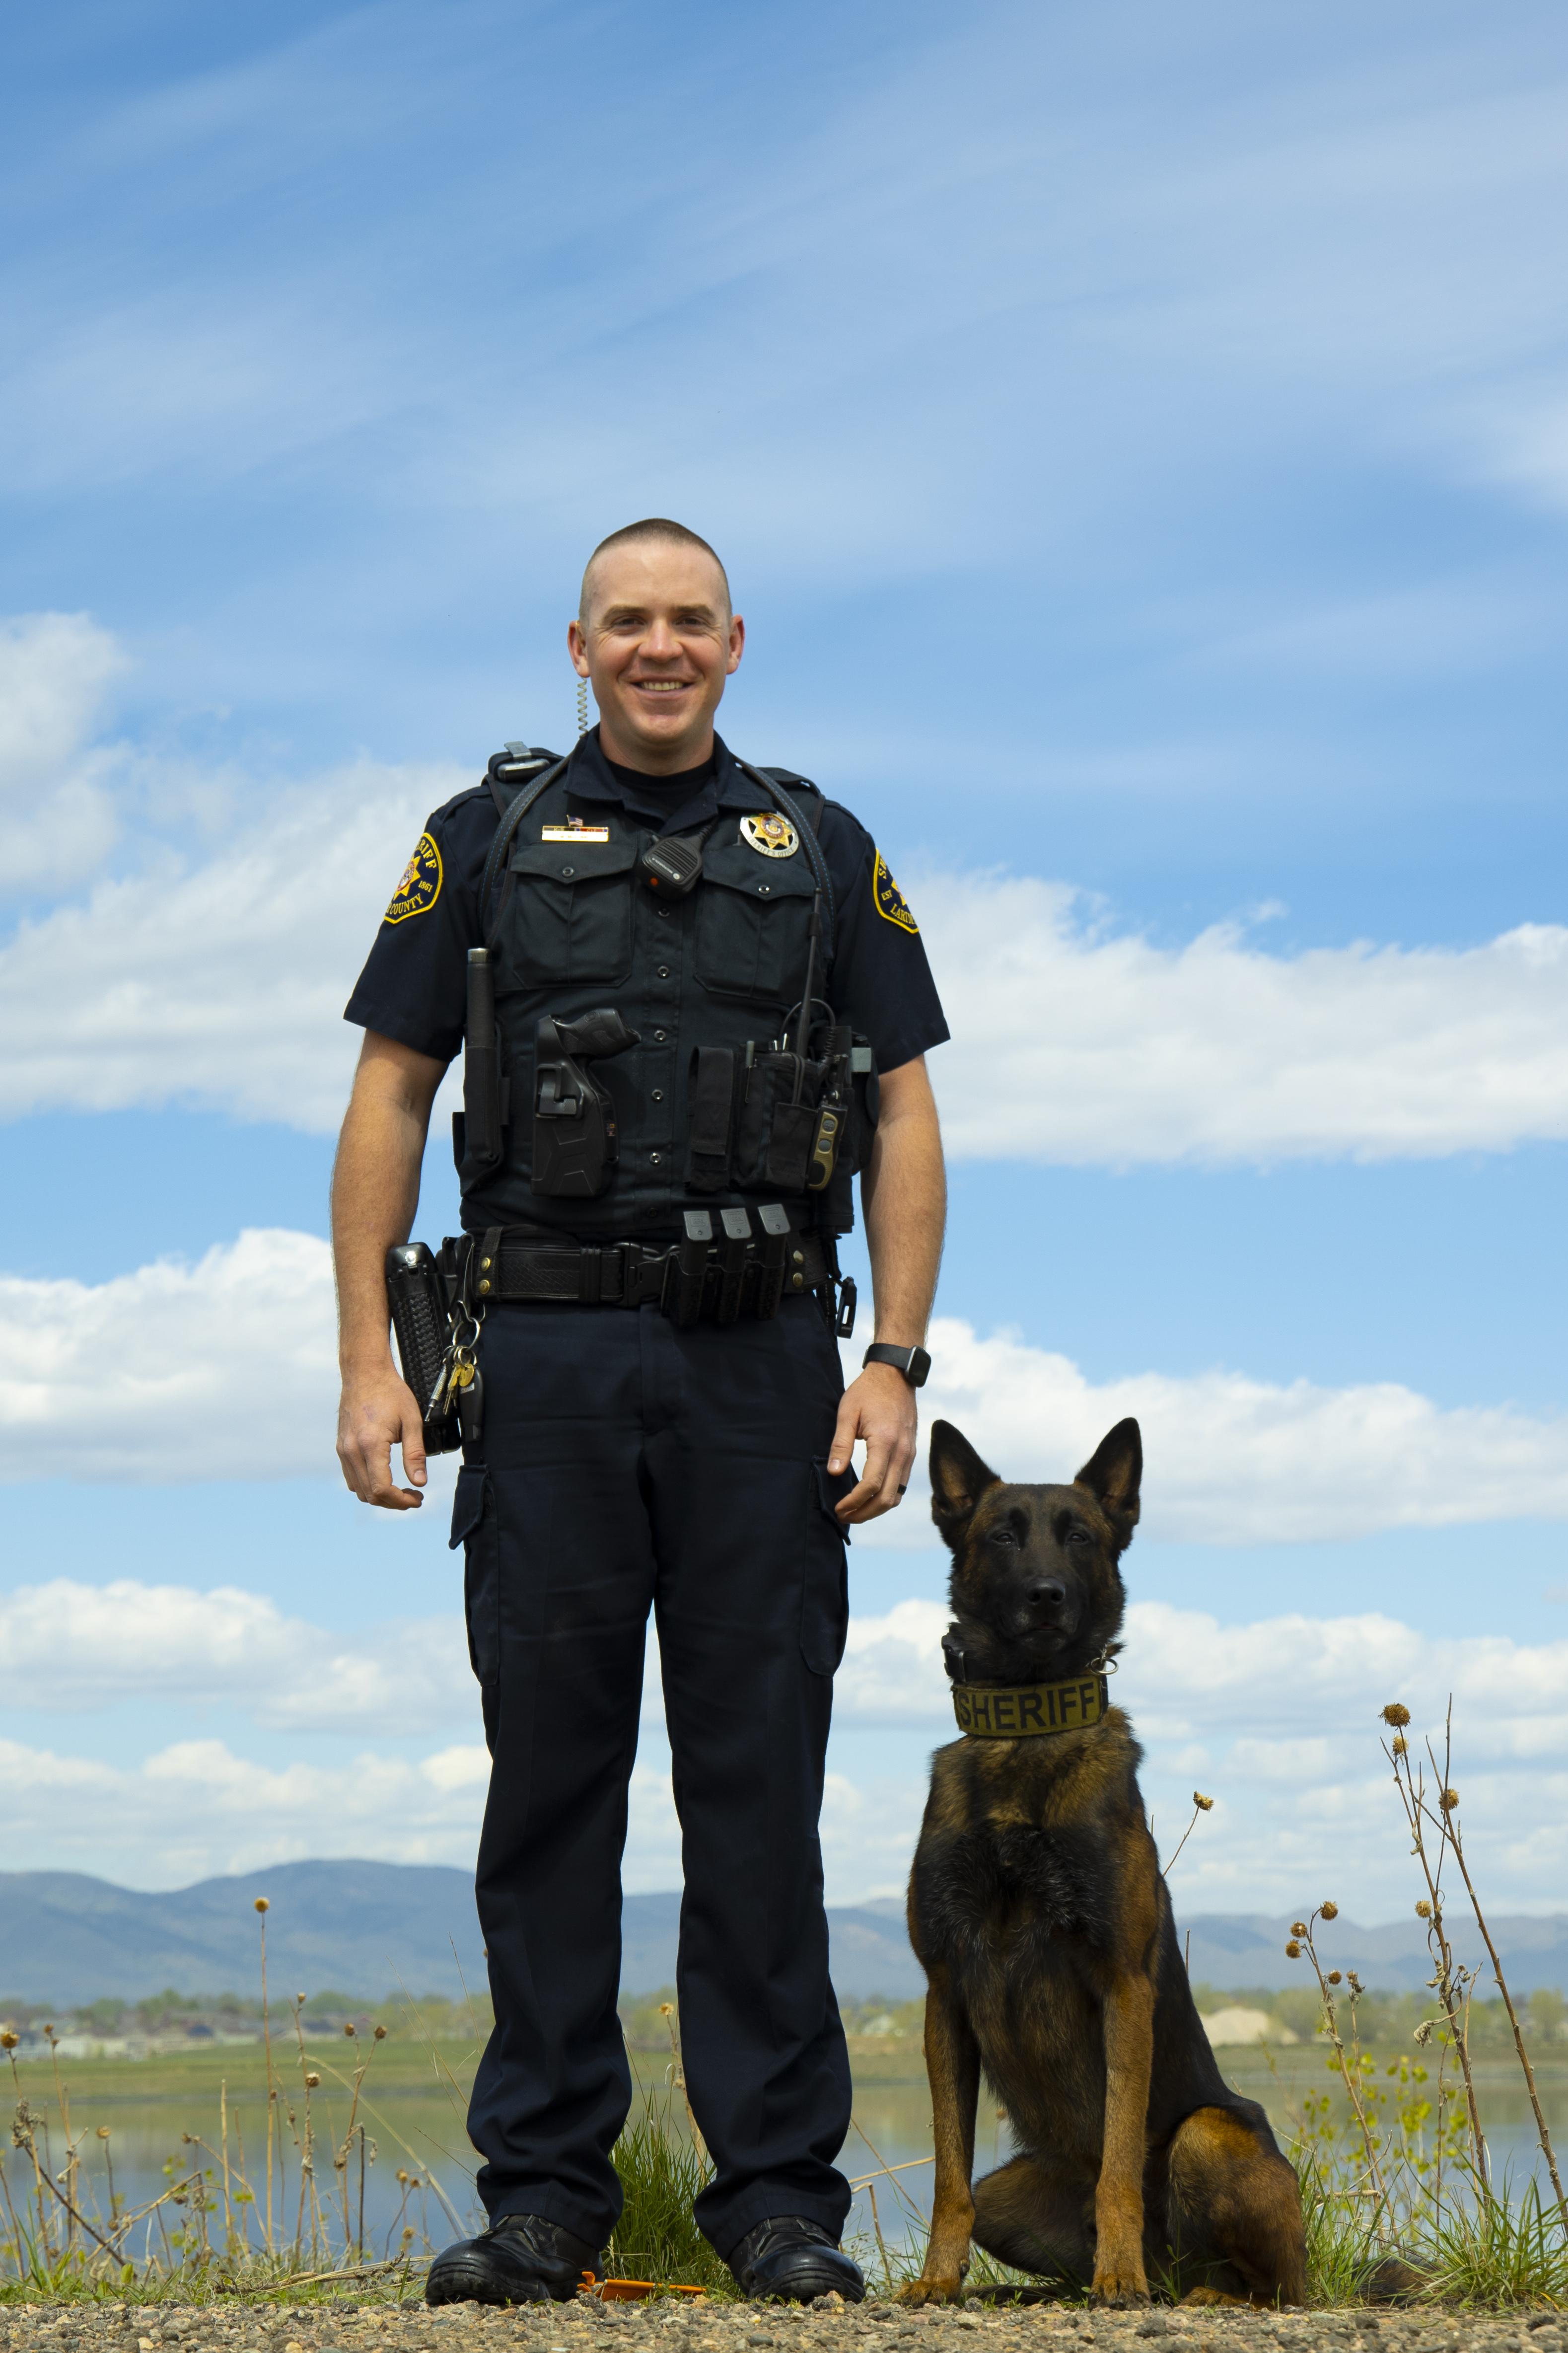 Image 5: Deputy Mitch McGuinnis and K9 Tyr (Belgian Malinois)